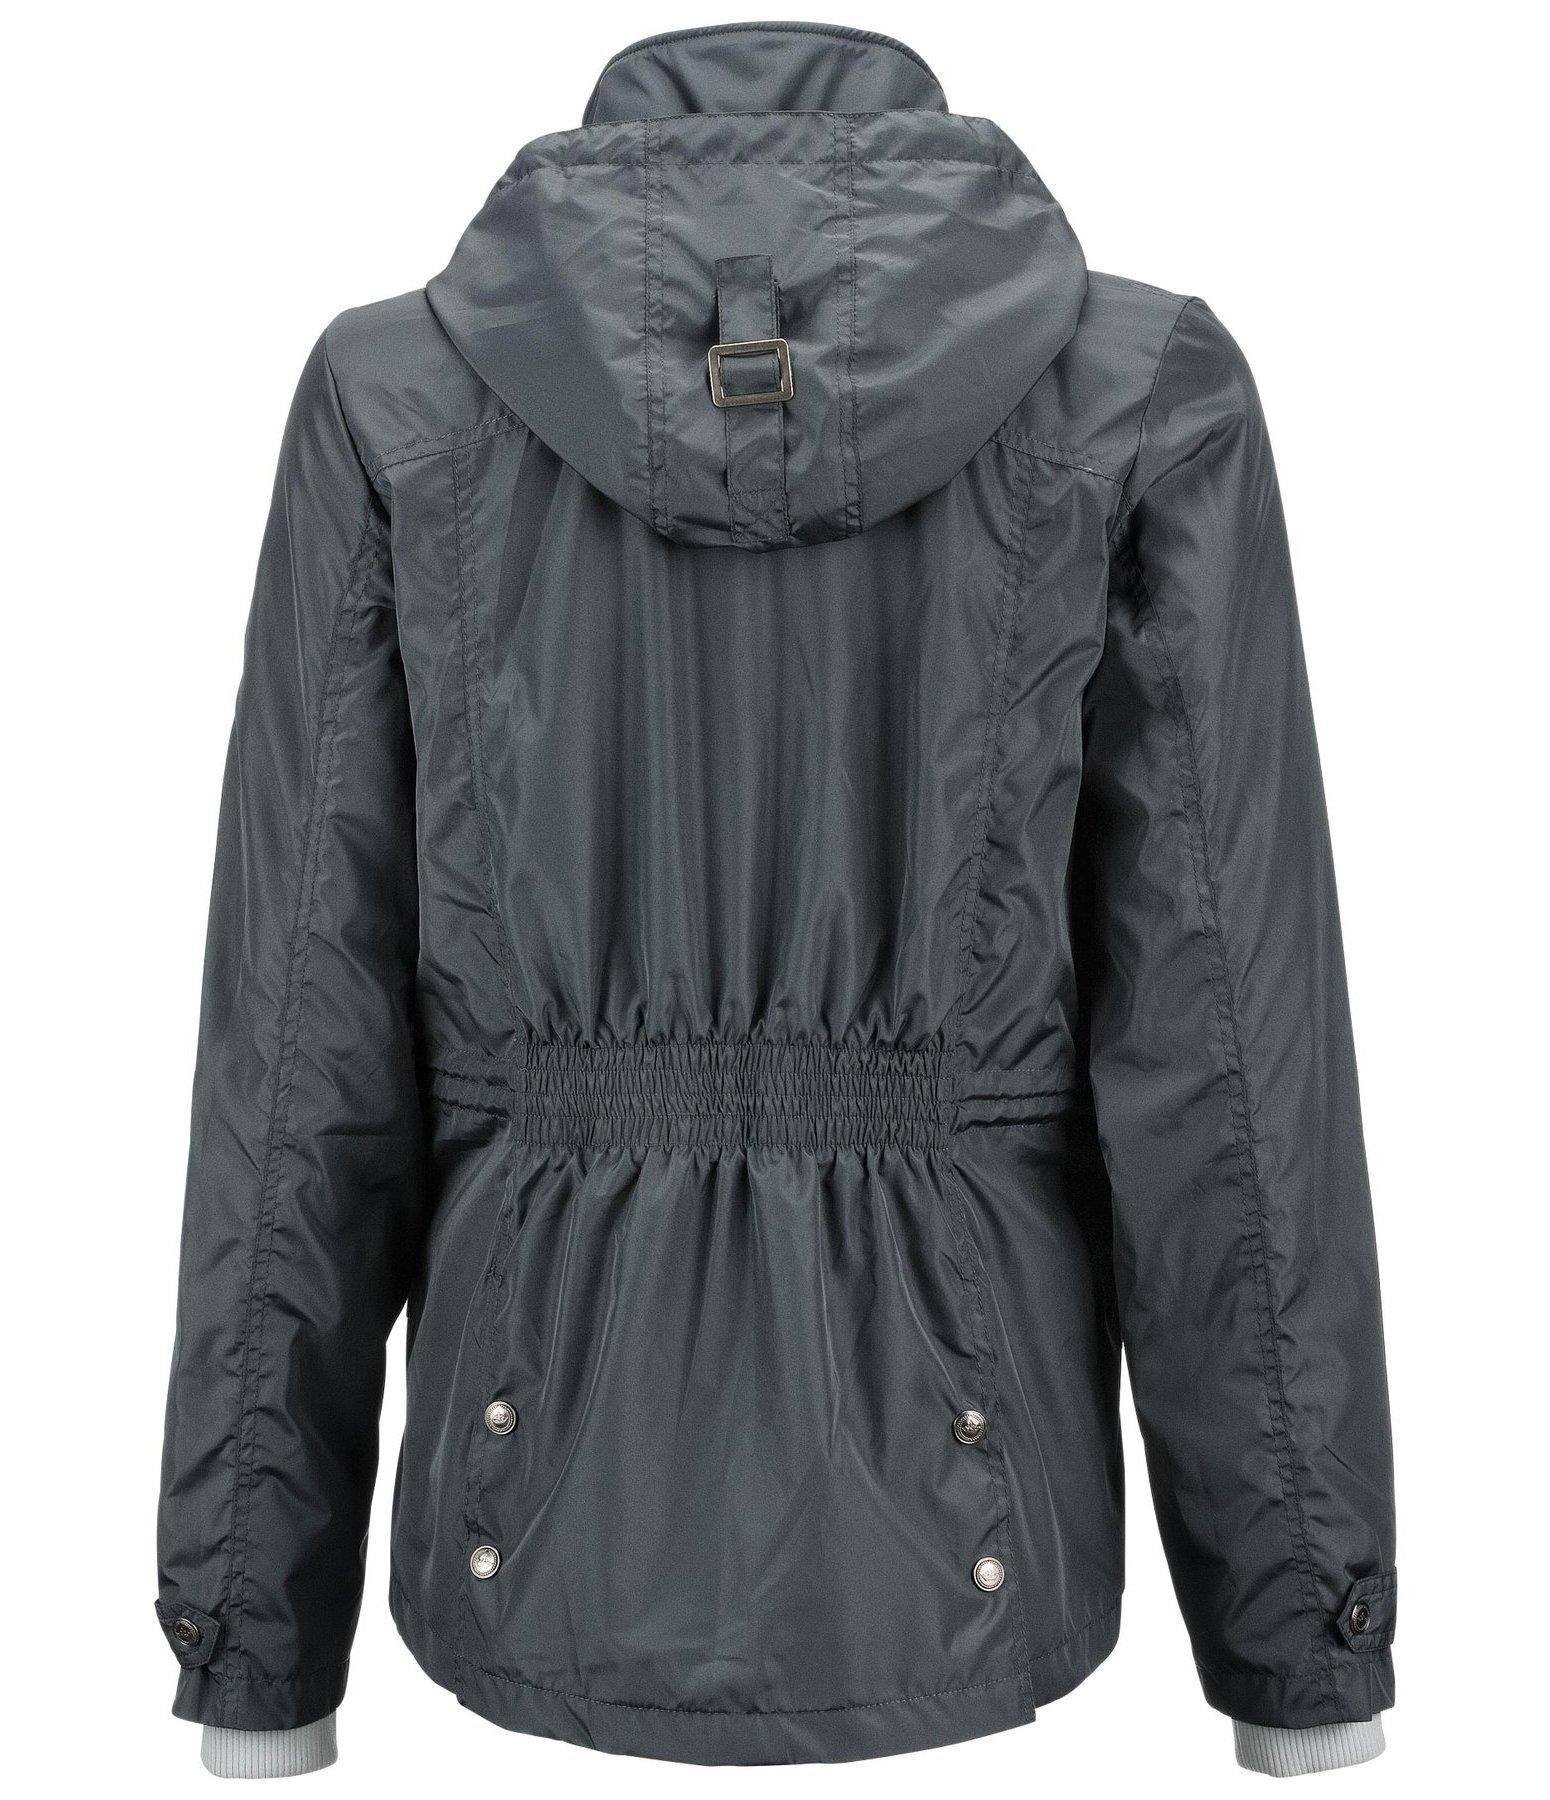 riding jacket leni ii summer jackets between seasons. Black Bedroom Furniture Sets. Home Design Ideas